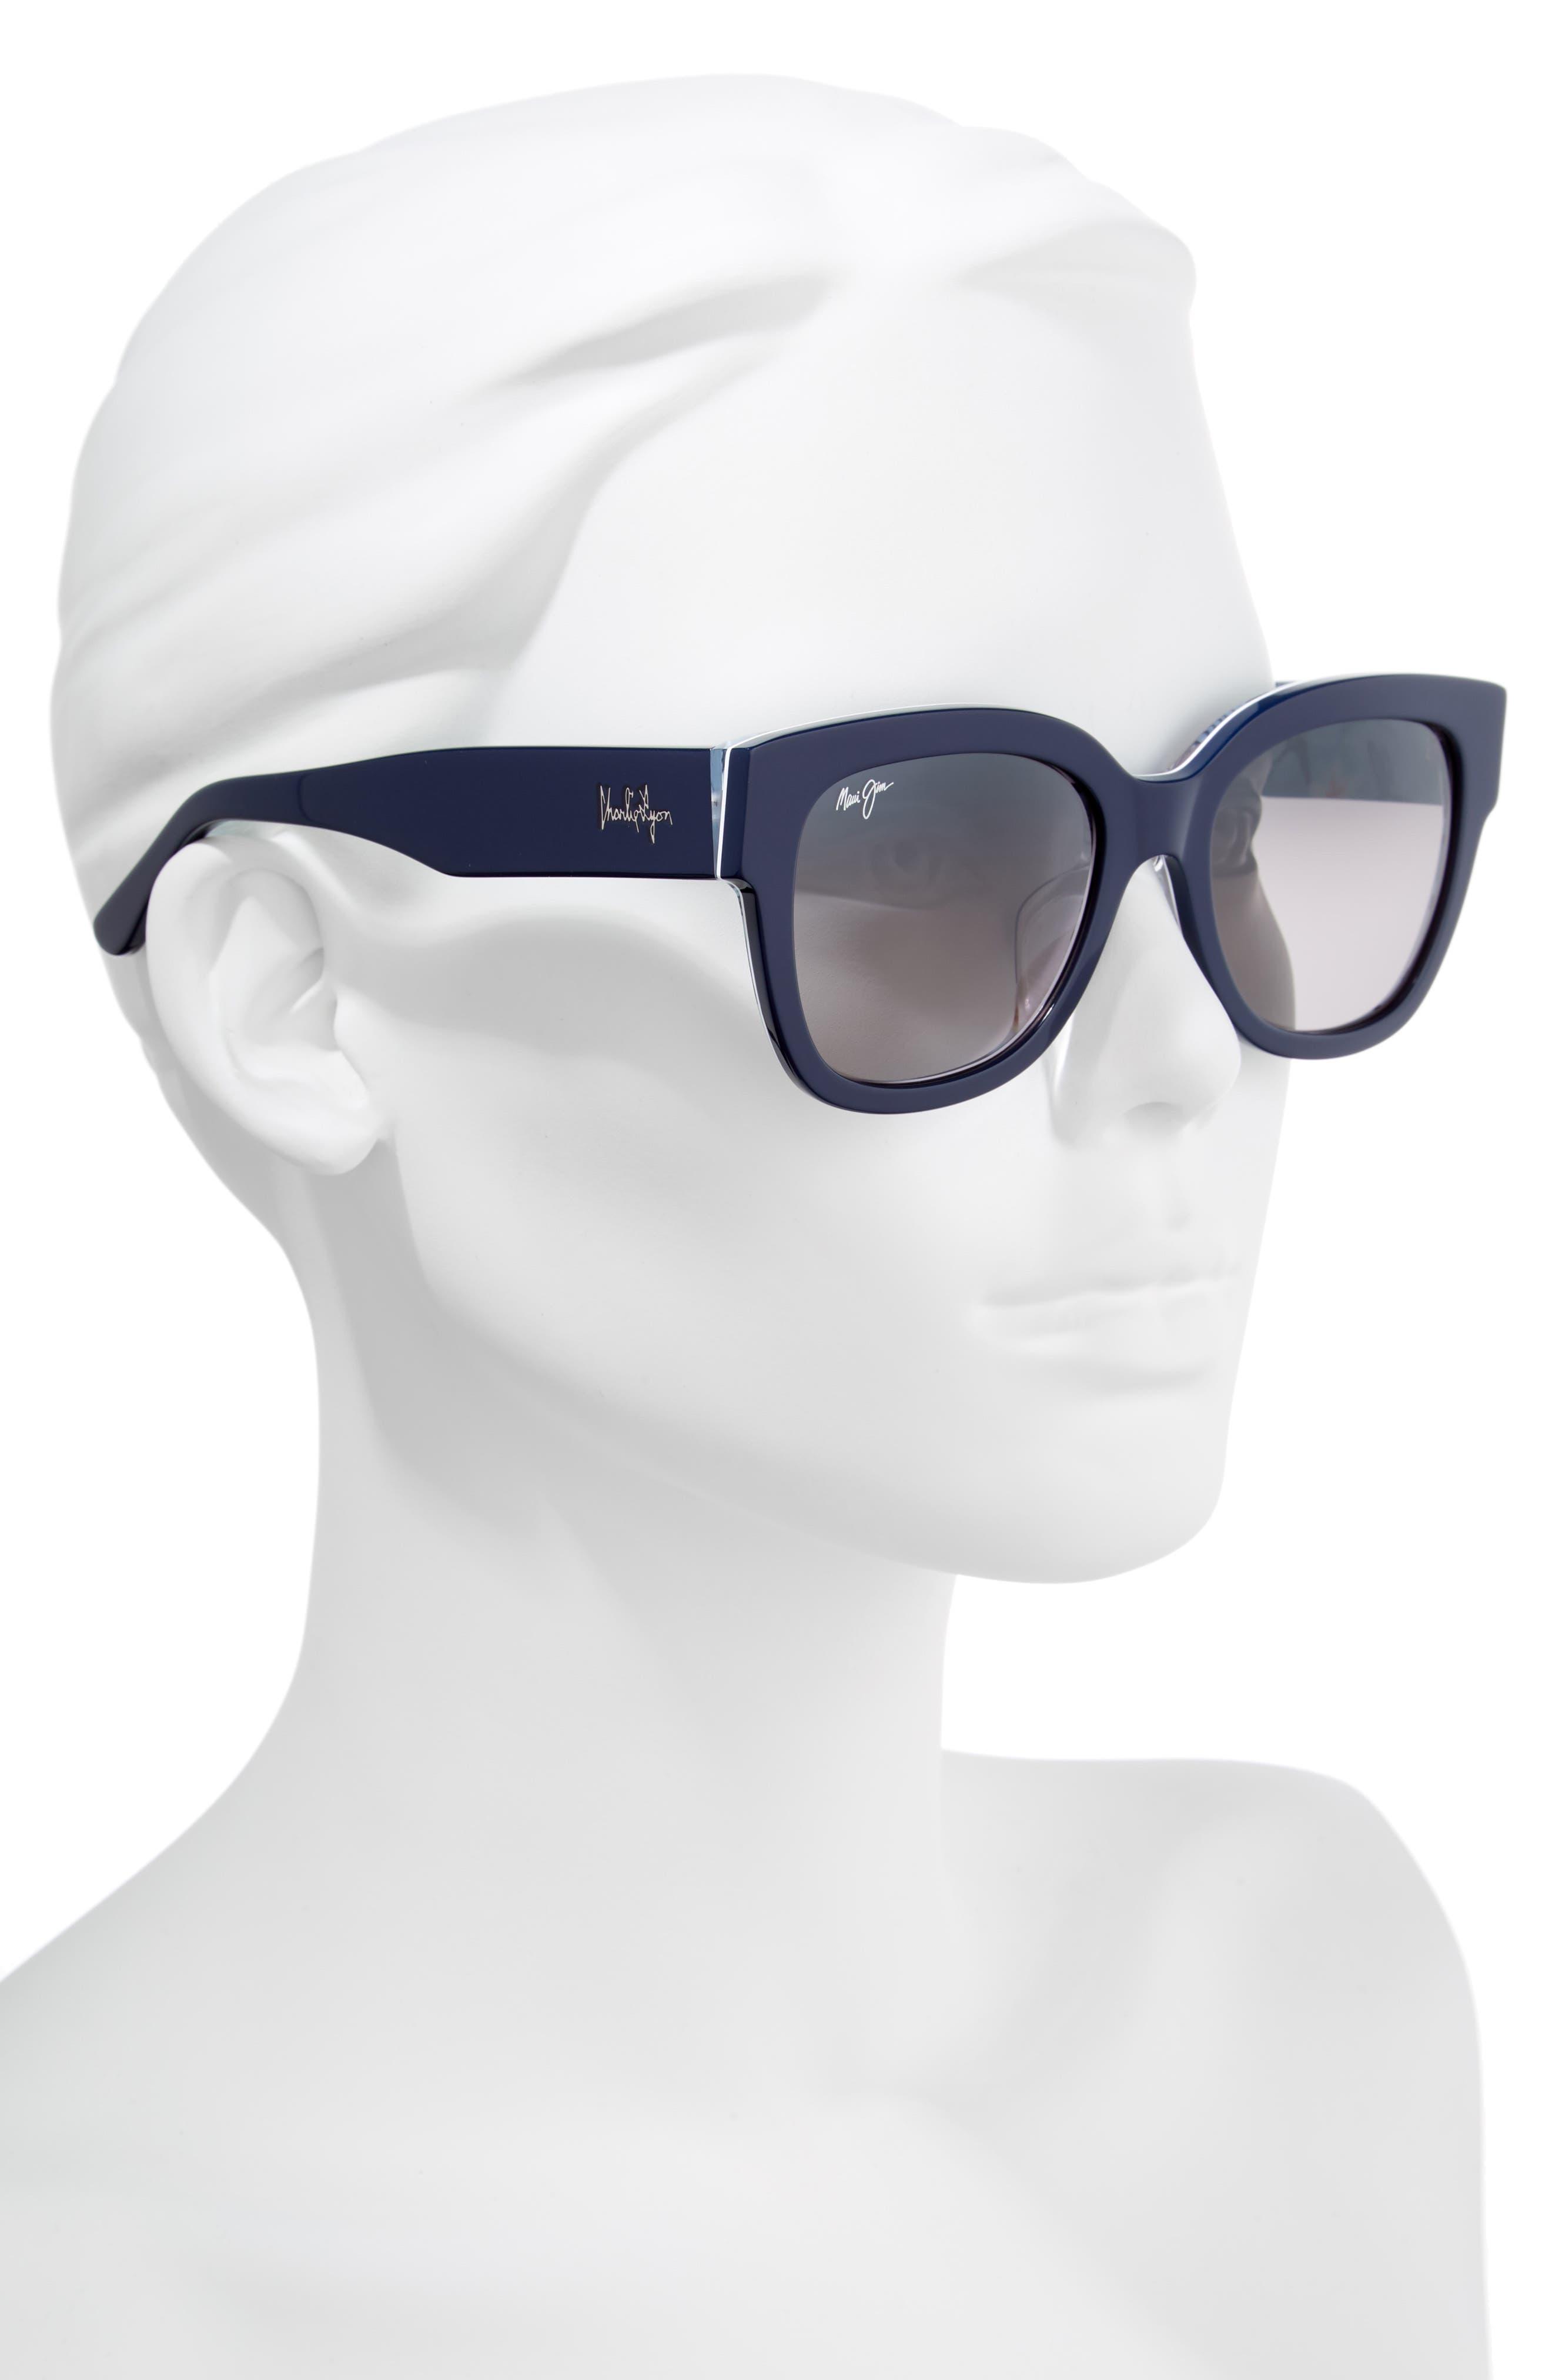 54mm Rhythm Polarized Sunglasses,                             Alternate thumbnail 2, color,                             NAVY BLUE/ NEUTRAL GREY